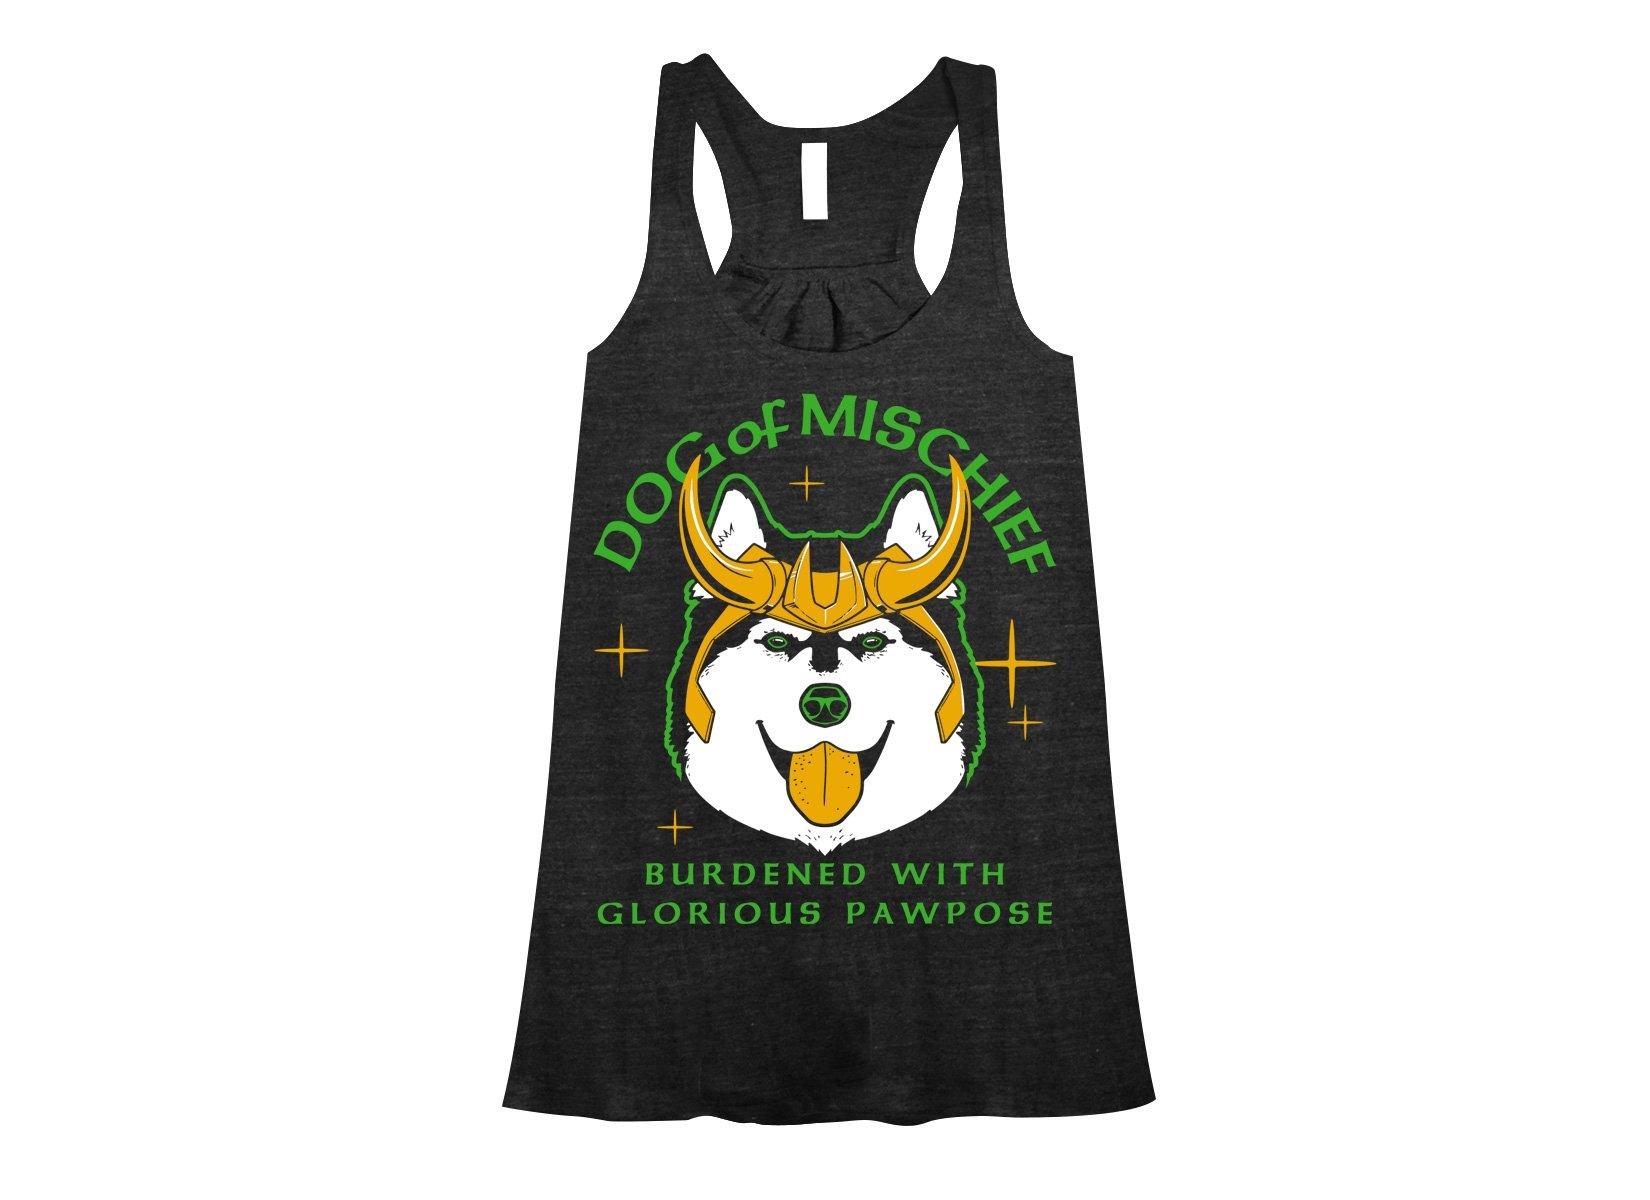 Dog Of Mischief on Womens Tanks T-Shirt